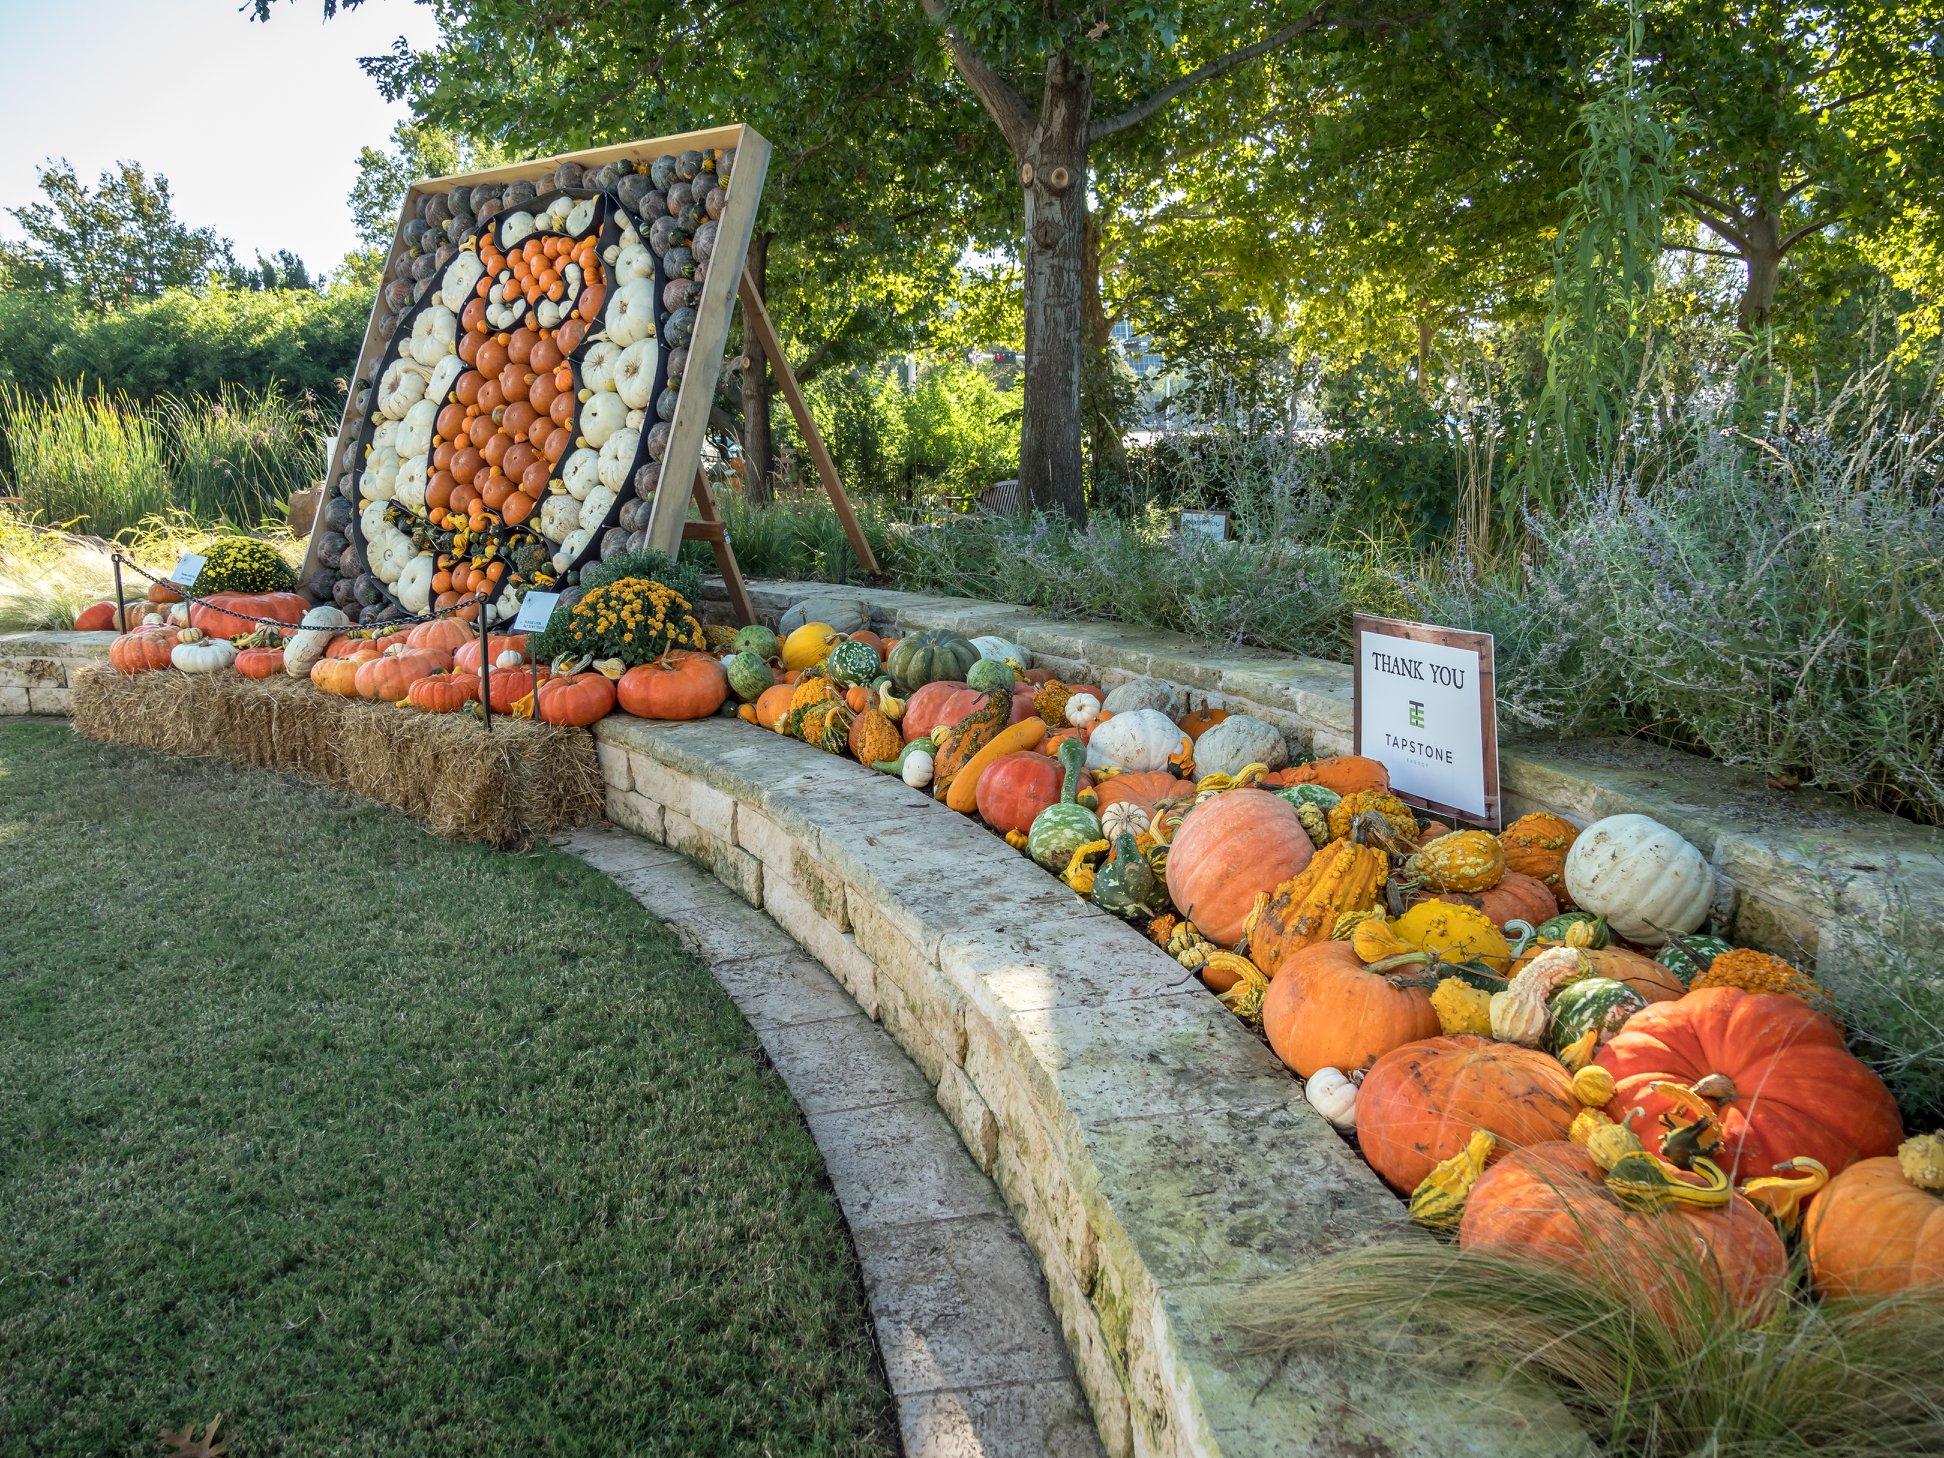 Top 10 Halloween Events in the Oklahoma City Metro Area